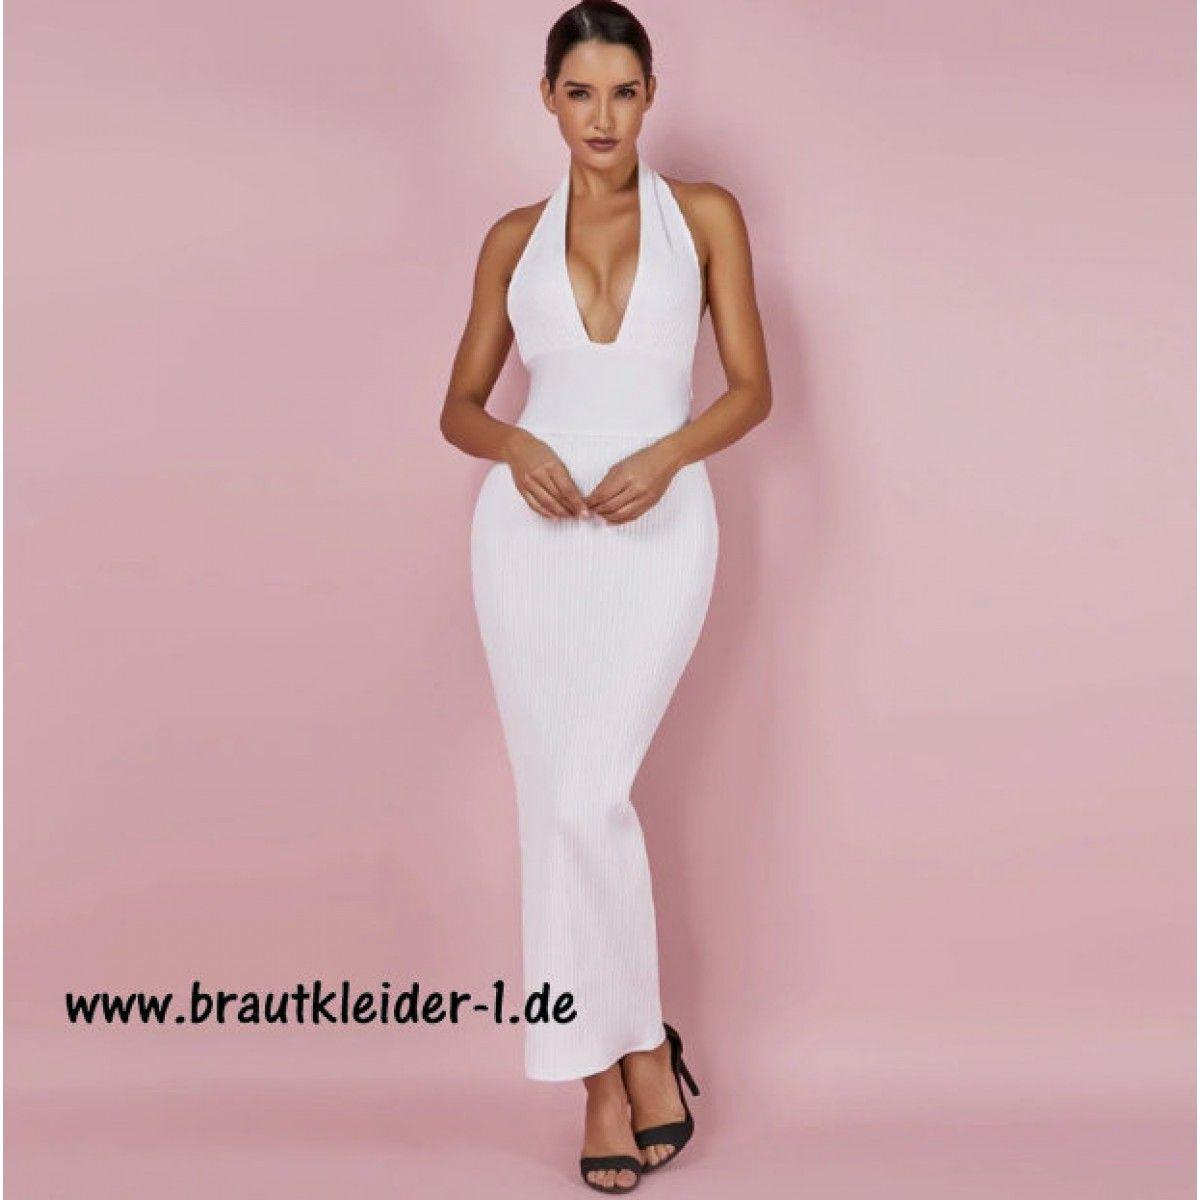 Designer Top Elegante Kleider Knöchellang für 201910 Großartig Elegante Kleider Knöchellang Galerie